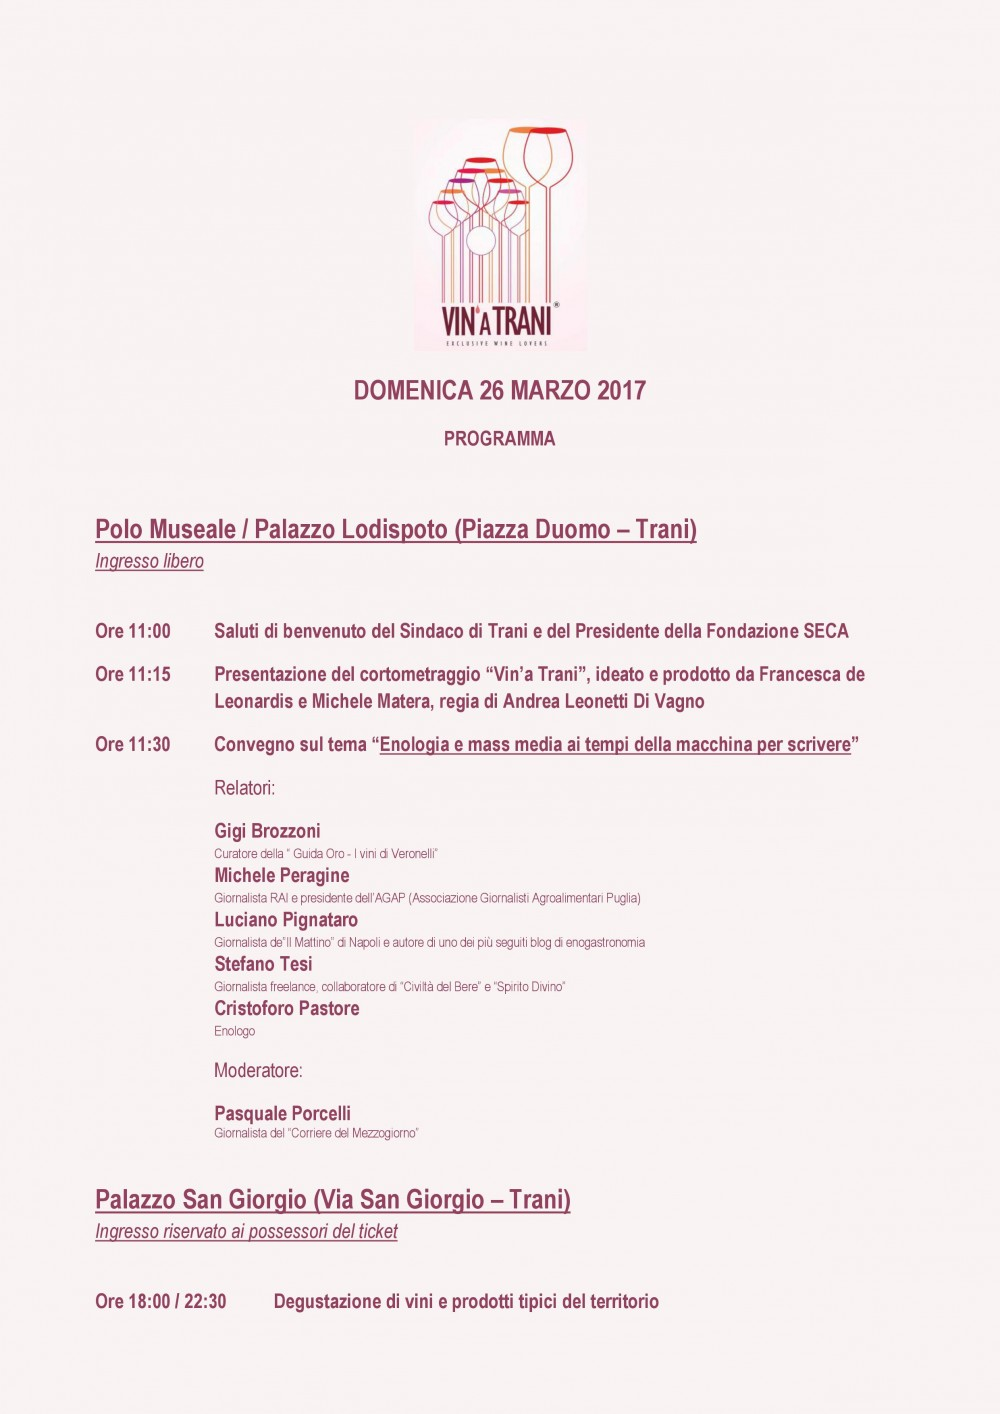 Vin' a Trani 2017, programma